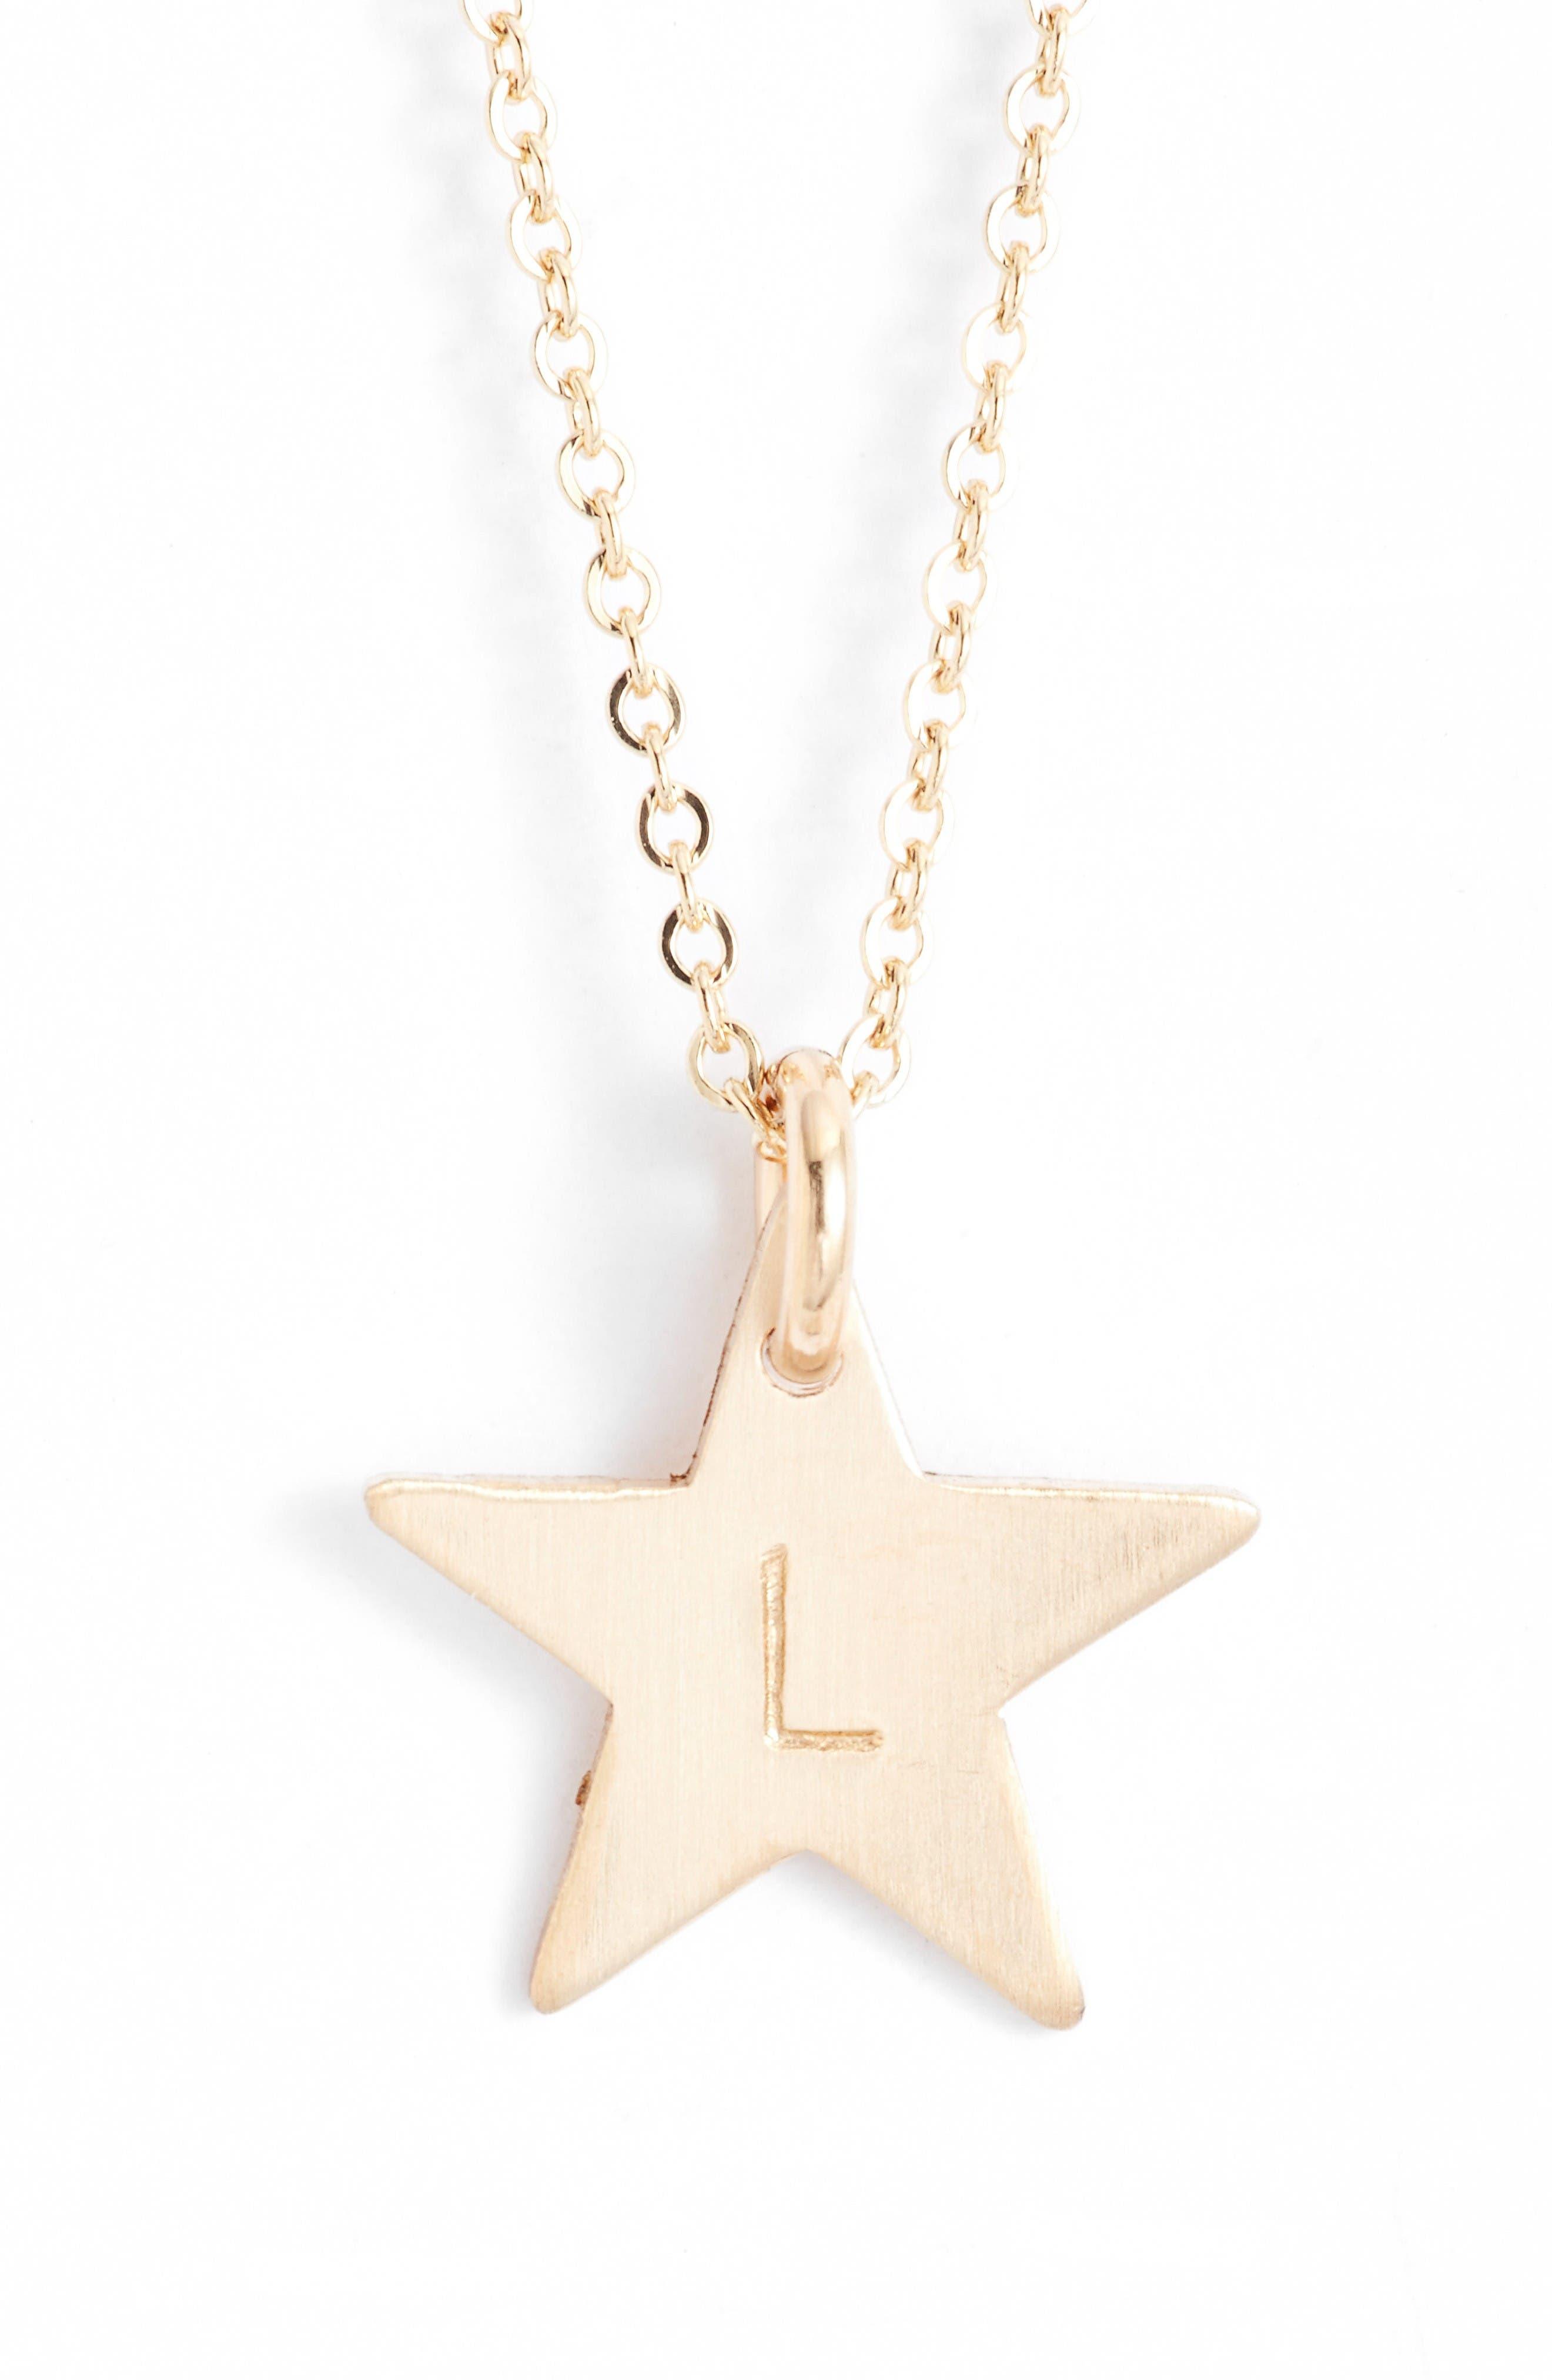 Nashelle 14k-Gold Fill Initial Mini Star Pendant Necklace